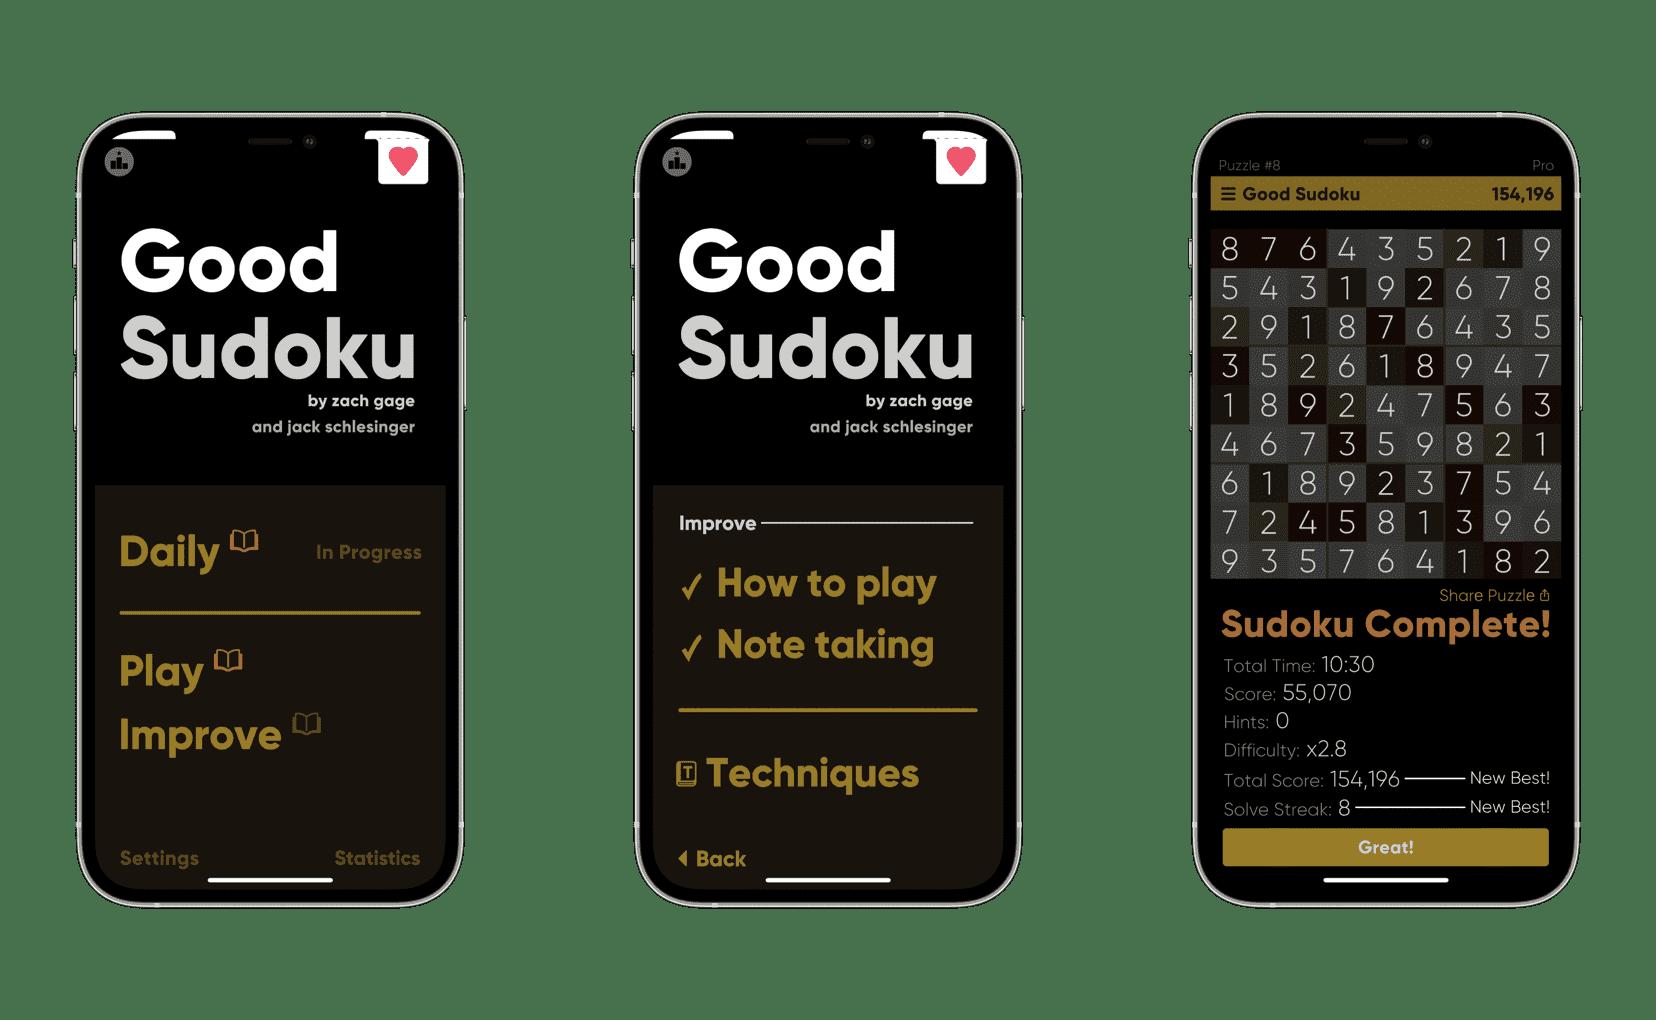 Good Sudoku app